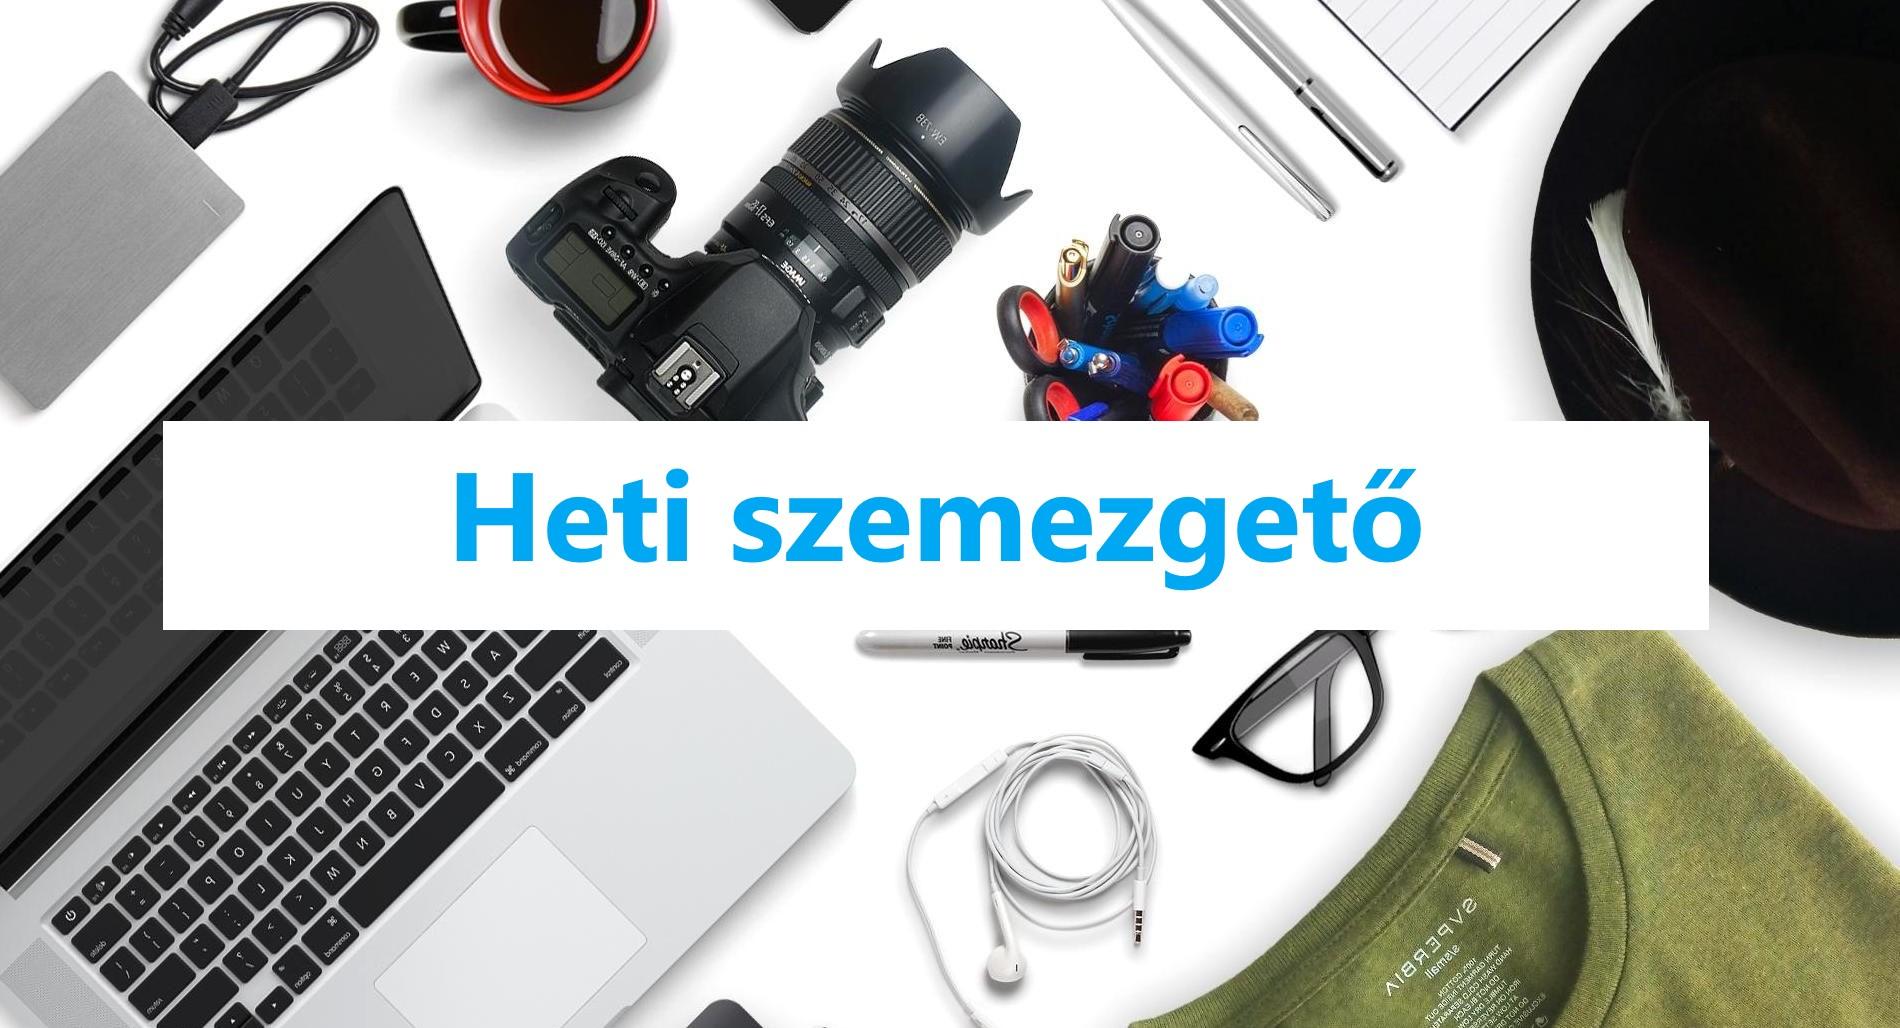 heti_szemezgeto_uj_14.jpg